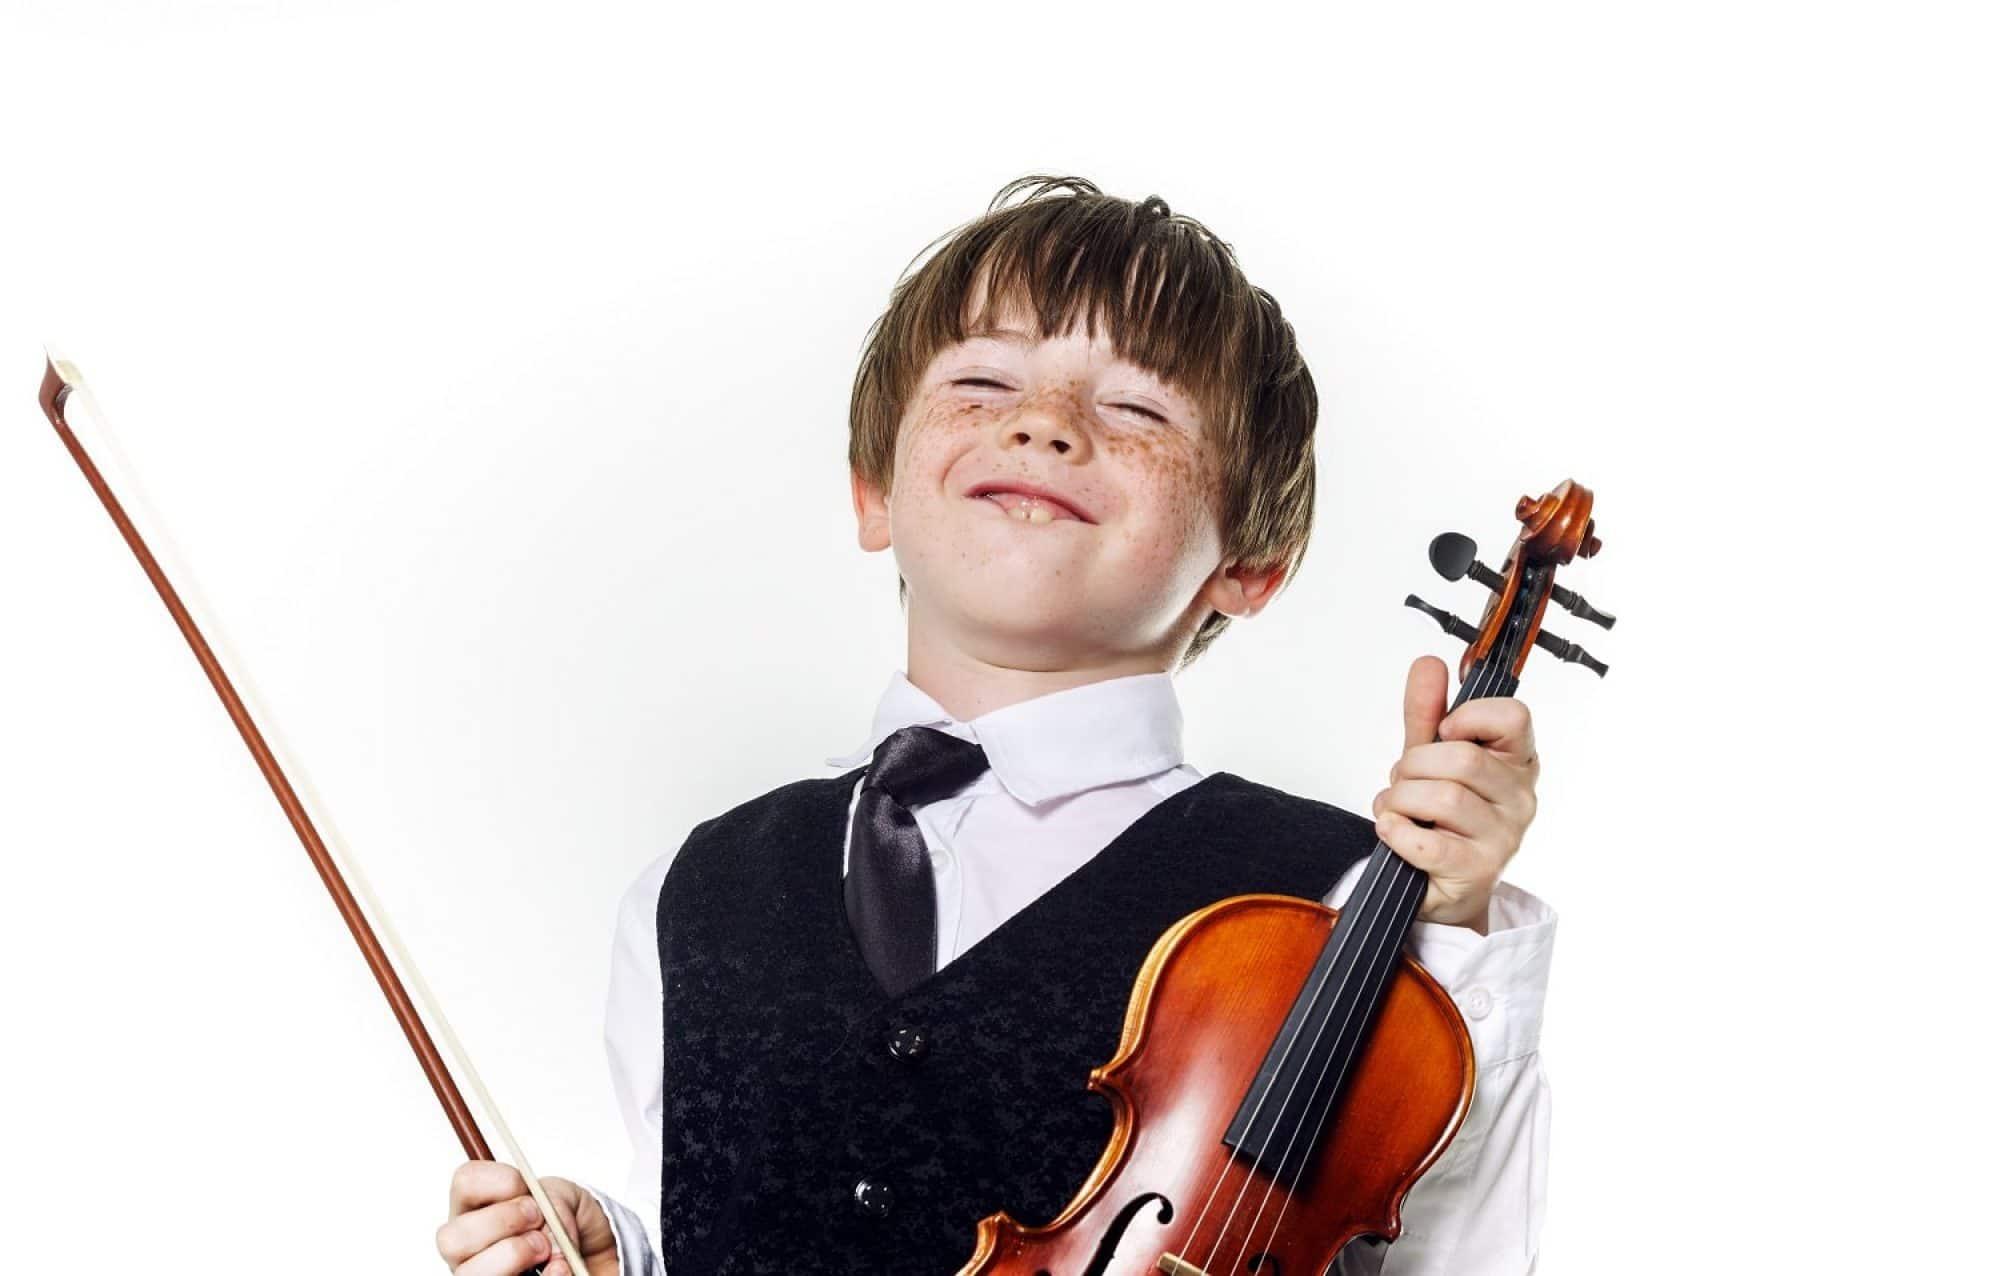 Su primer instrumento musical